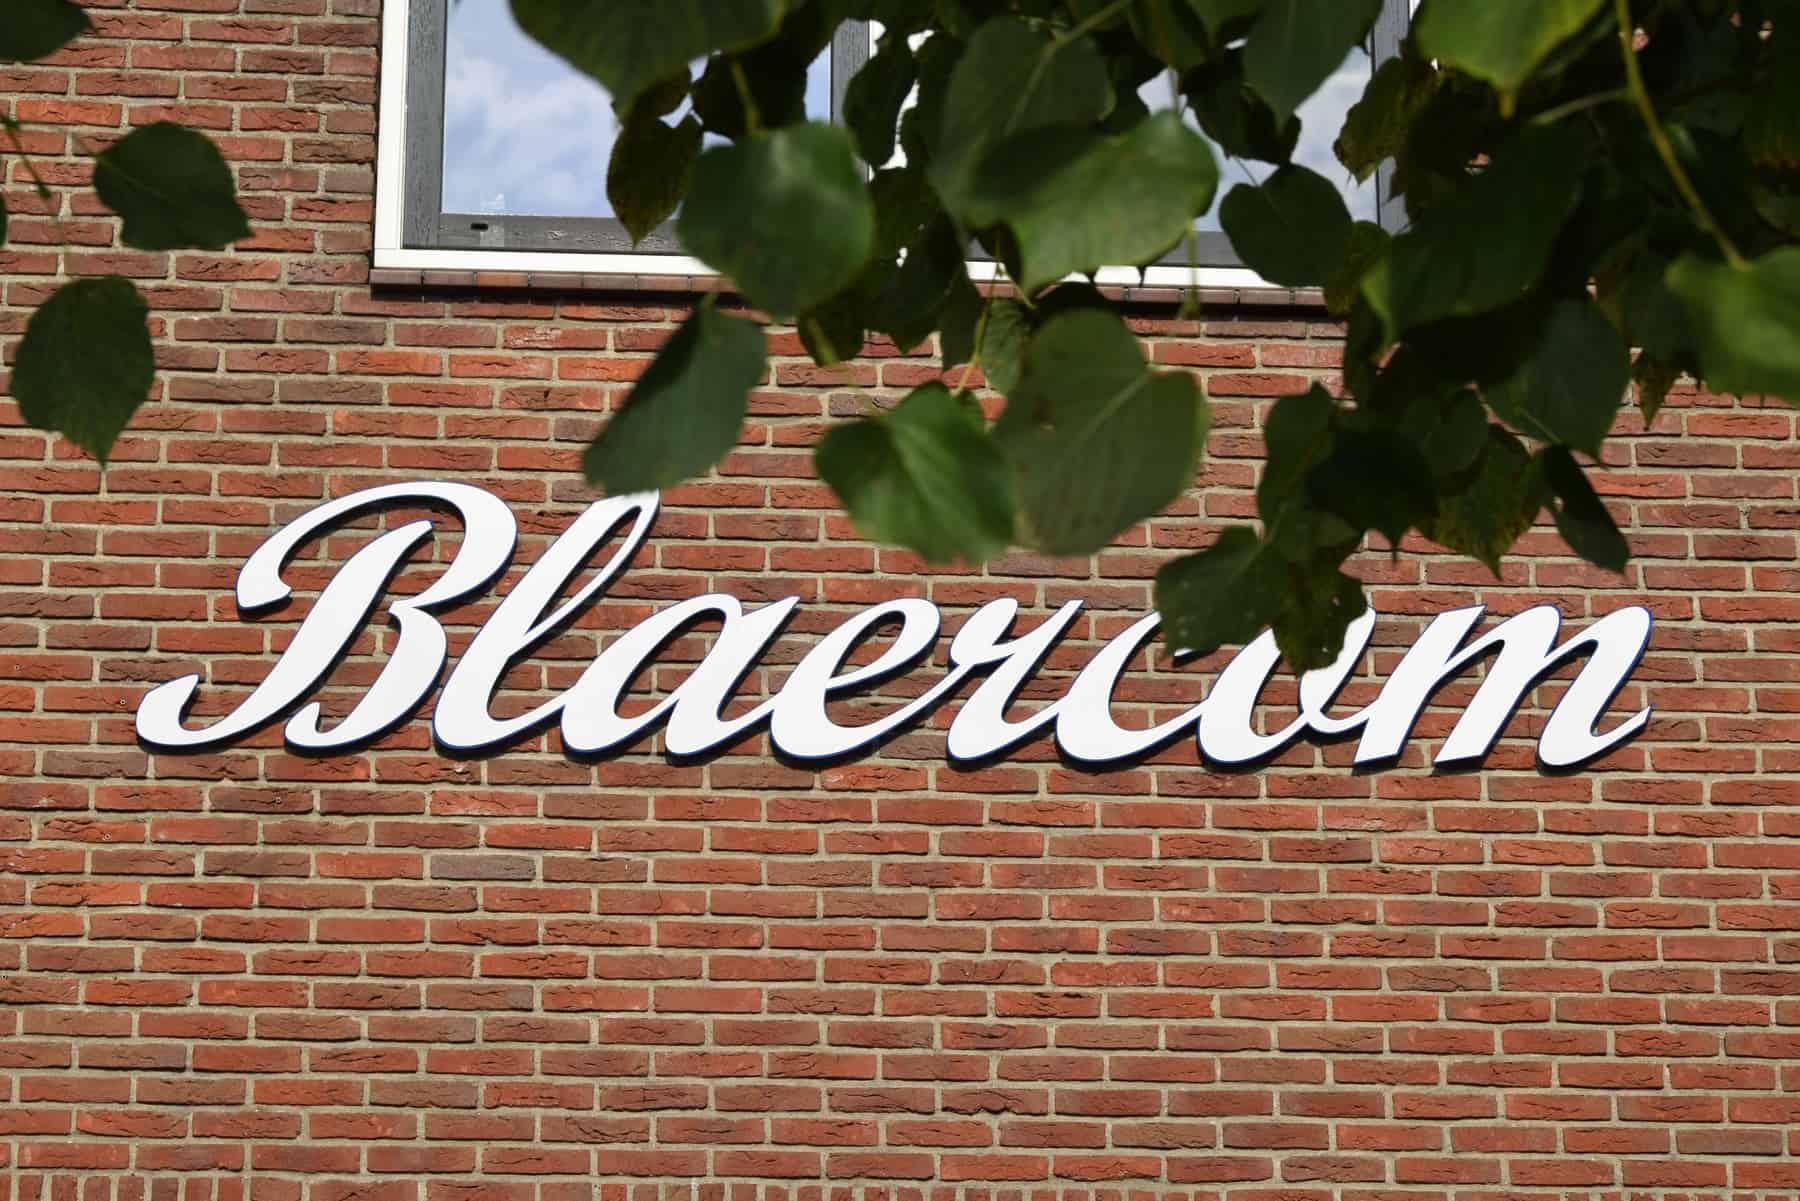 Dorpshuis Blaercom Blaricum